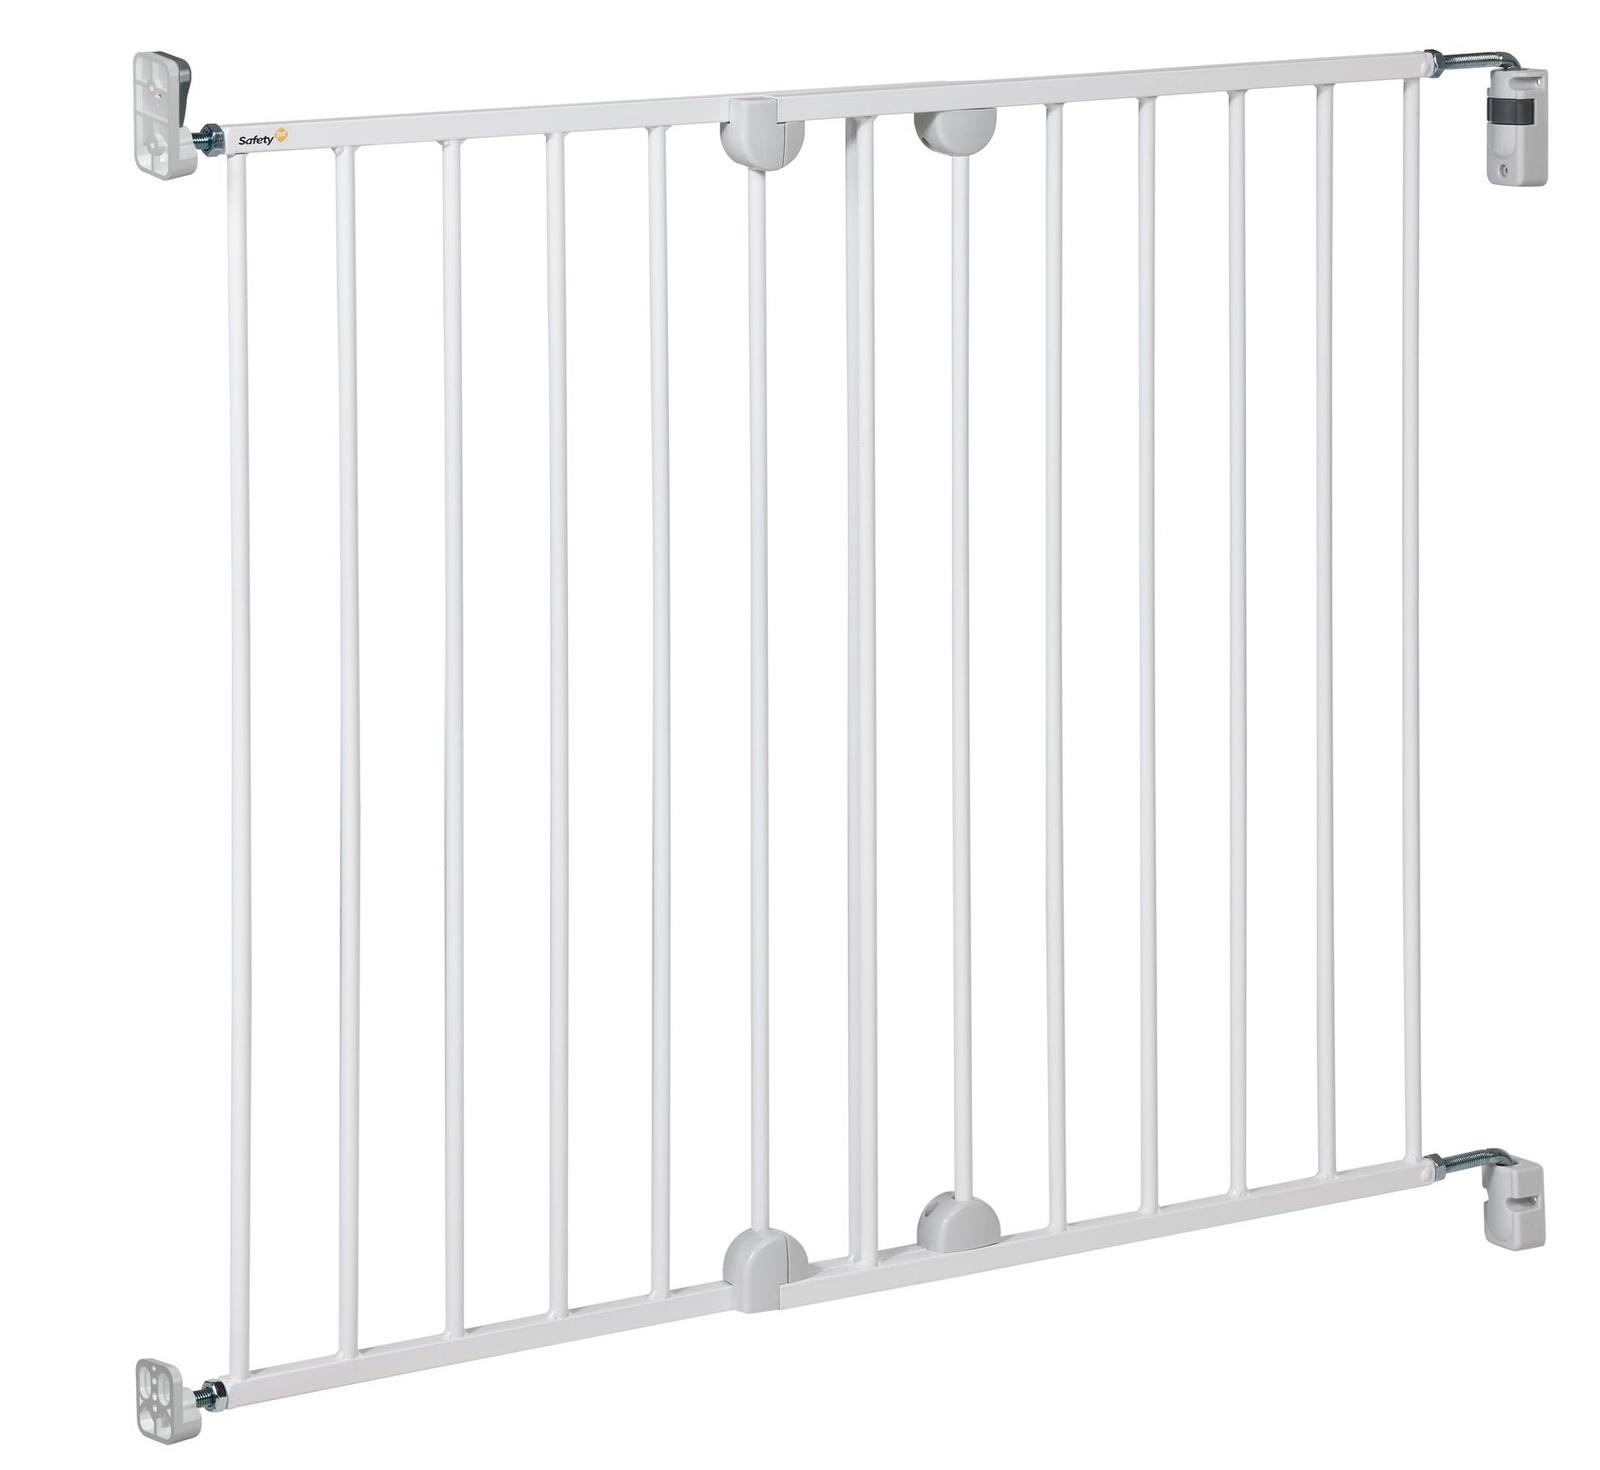 Ворота безопасности Safety 1st WALL-FIX EXTENDING METAL, 2438431000, 2438431000 белый